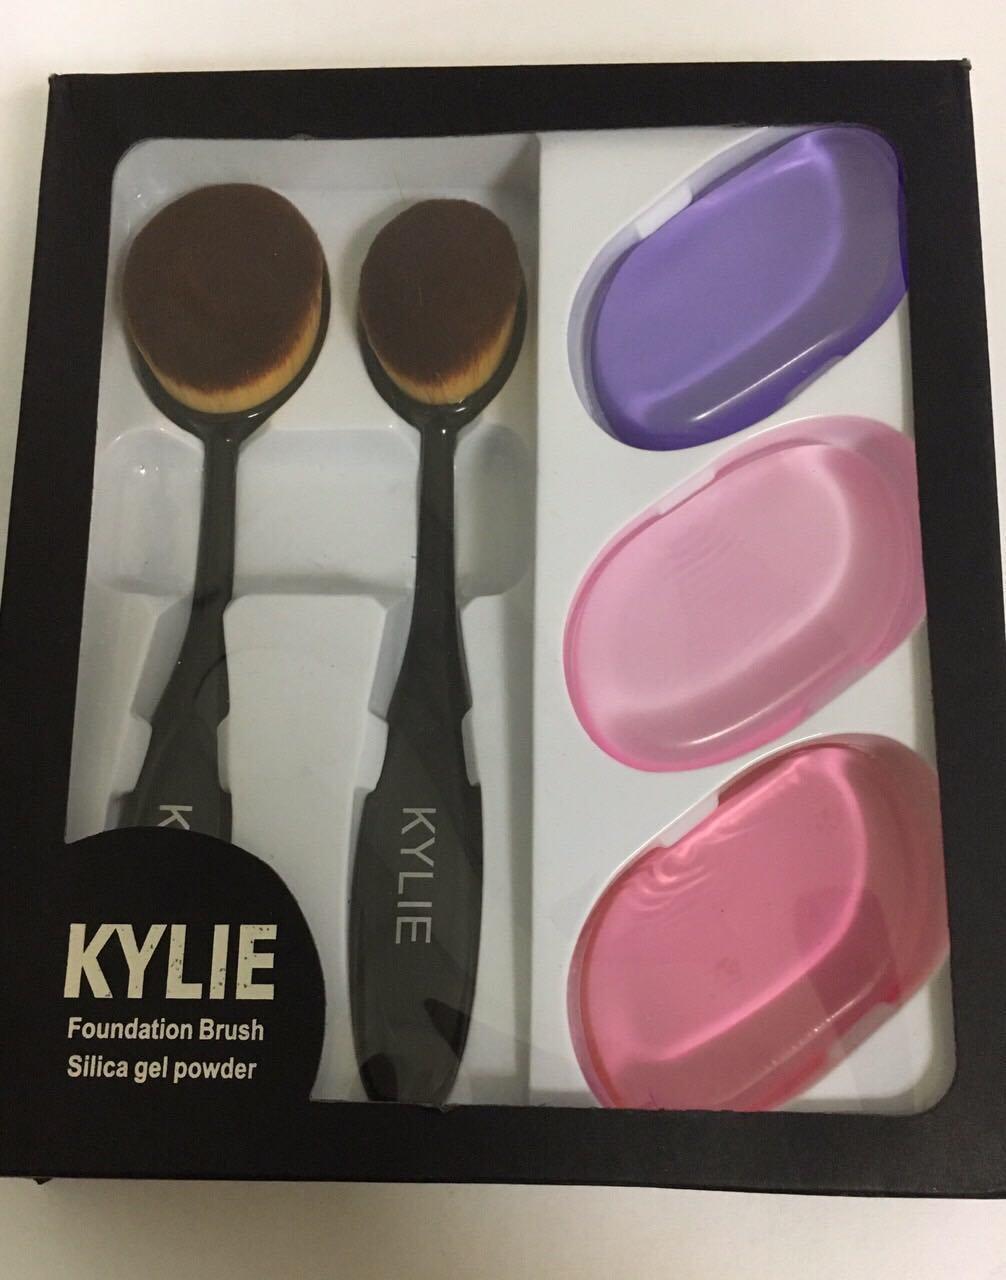 Уценка Набор kylie foundation brush silica gel poved - примятая упаковка